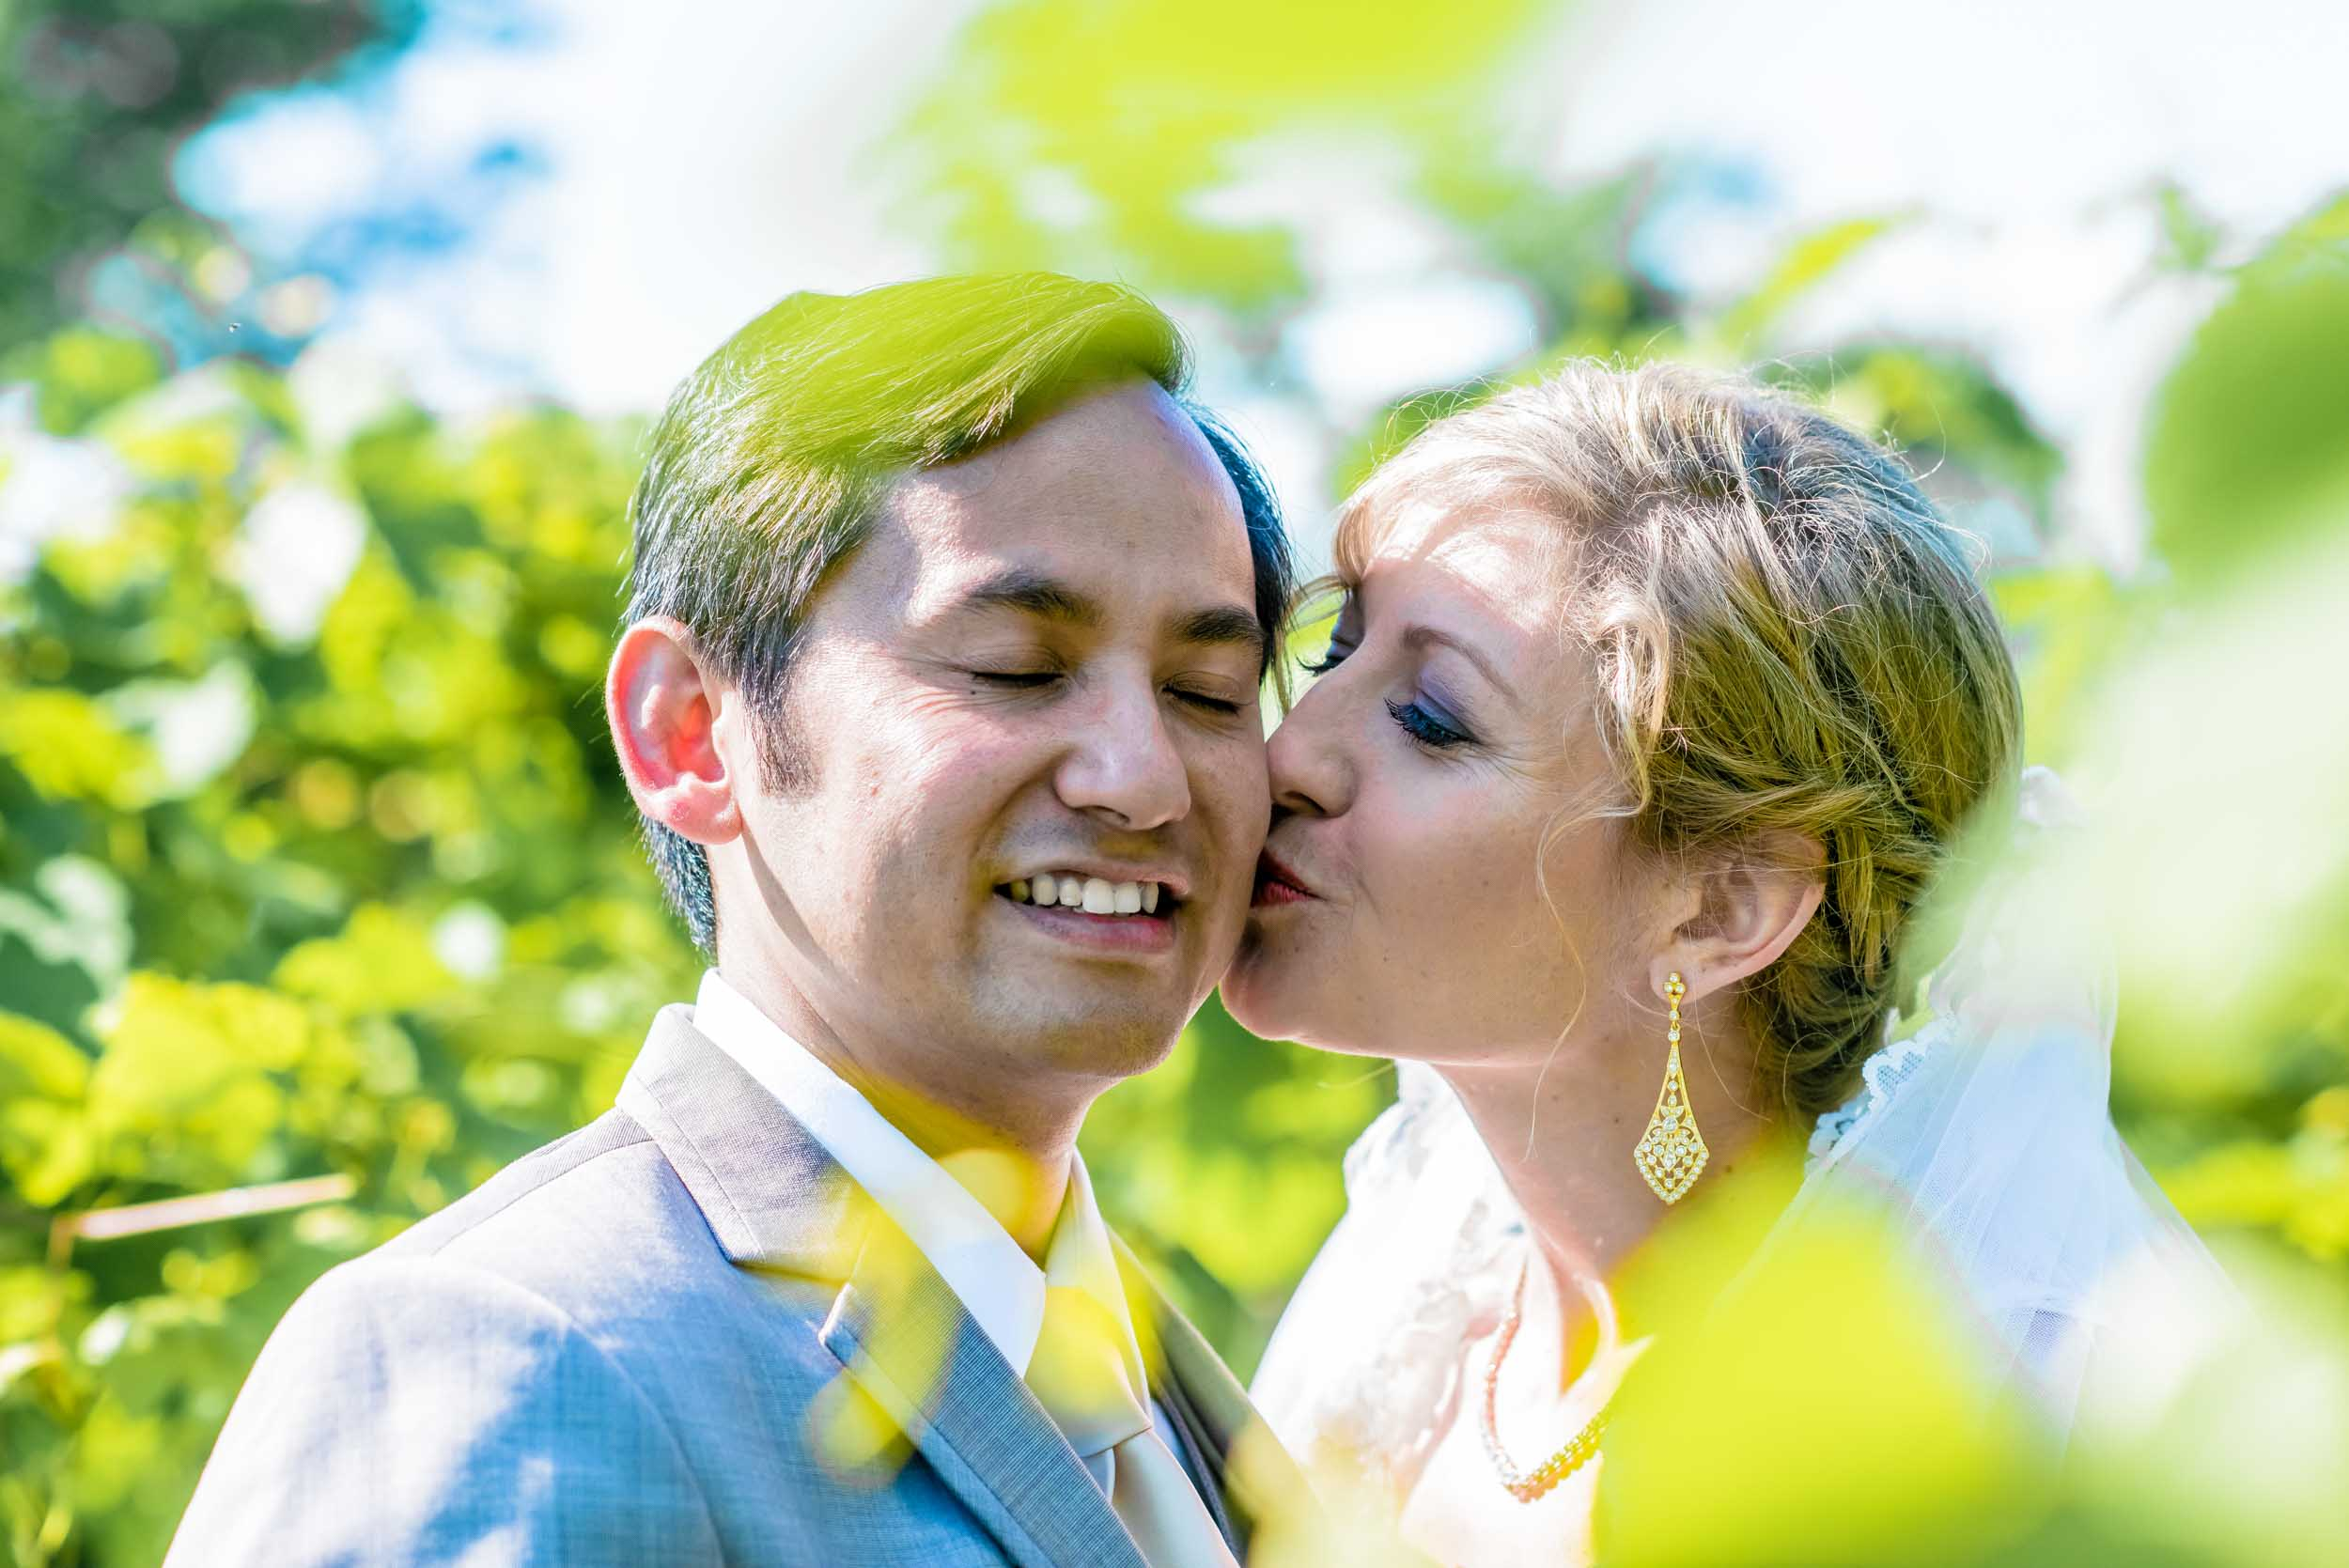 dc+metro+wedding+photographer+vadym+guliuk+photography+weddings+first-look-2025.jpg